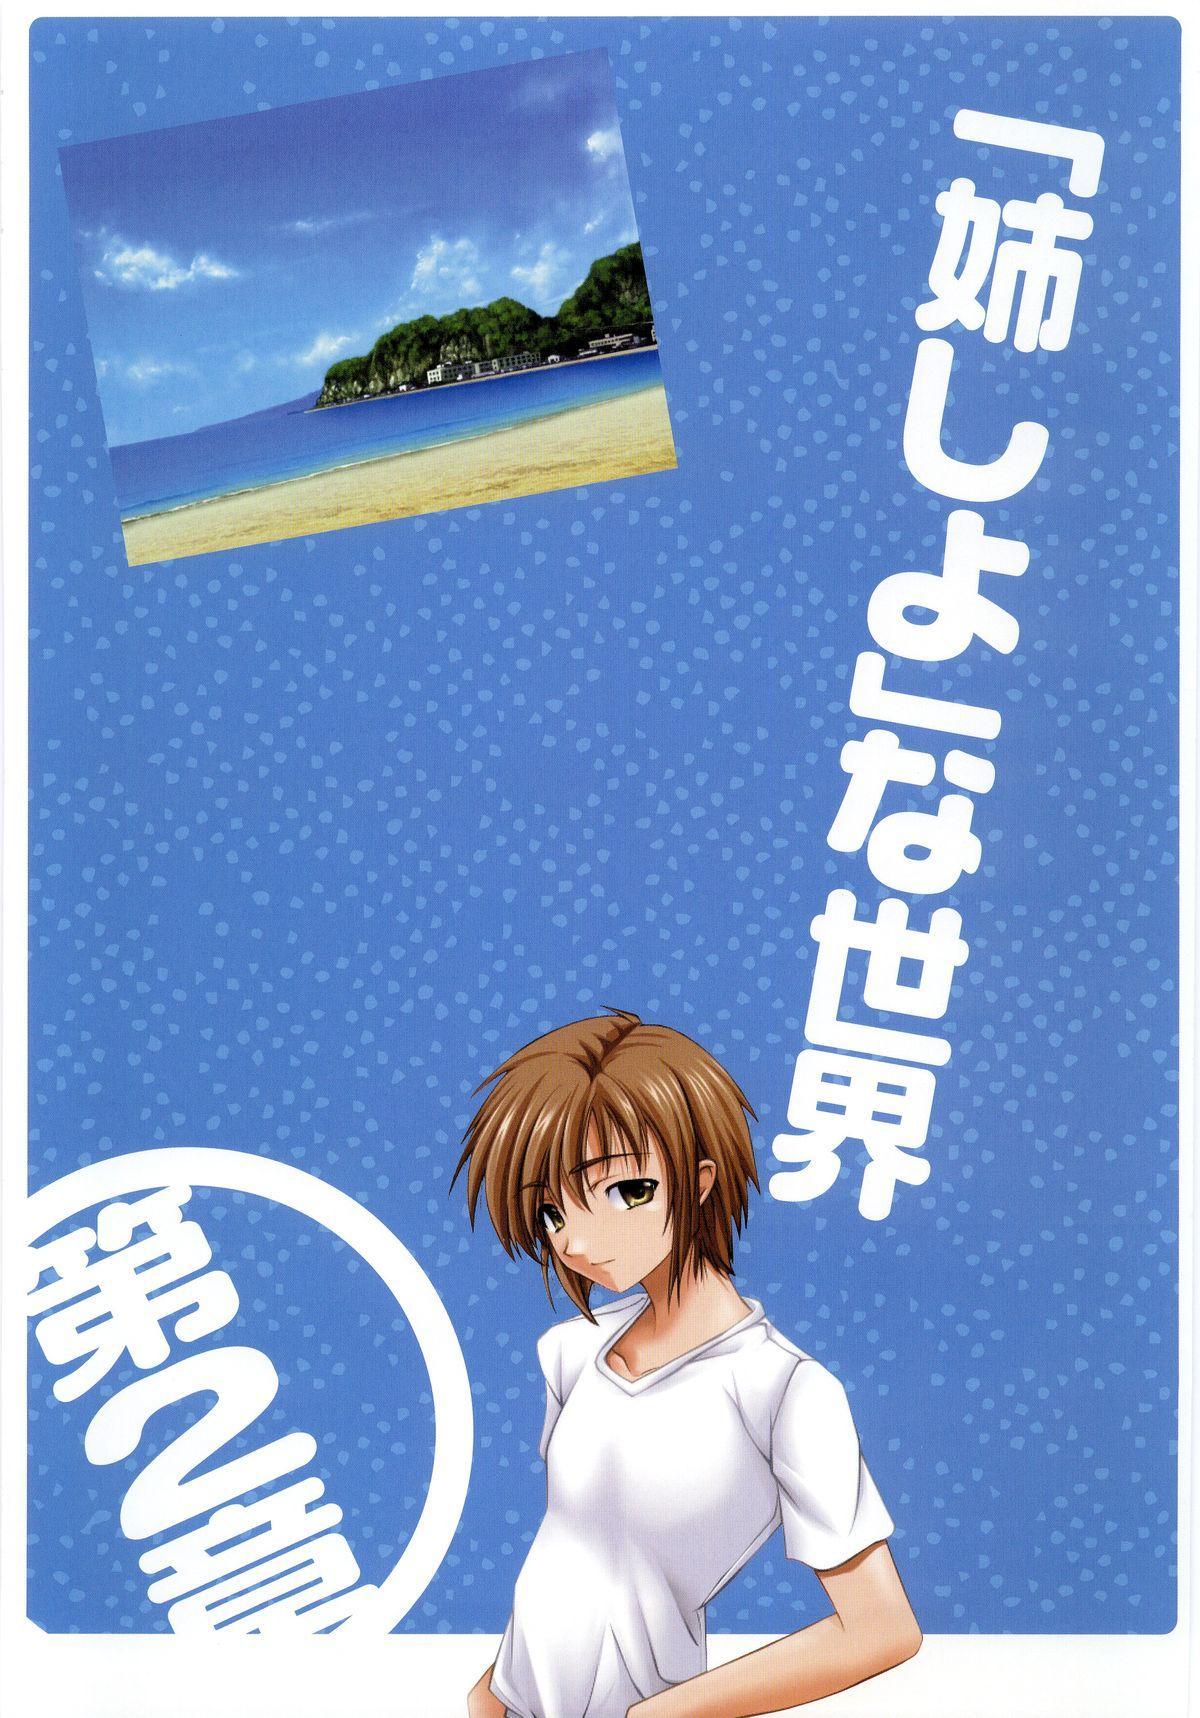 Nee, Chan to Shiyou yo! Koushiki Fanbook - Ai to Batou no Hibi 60